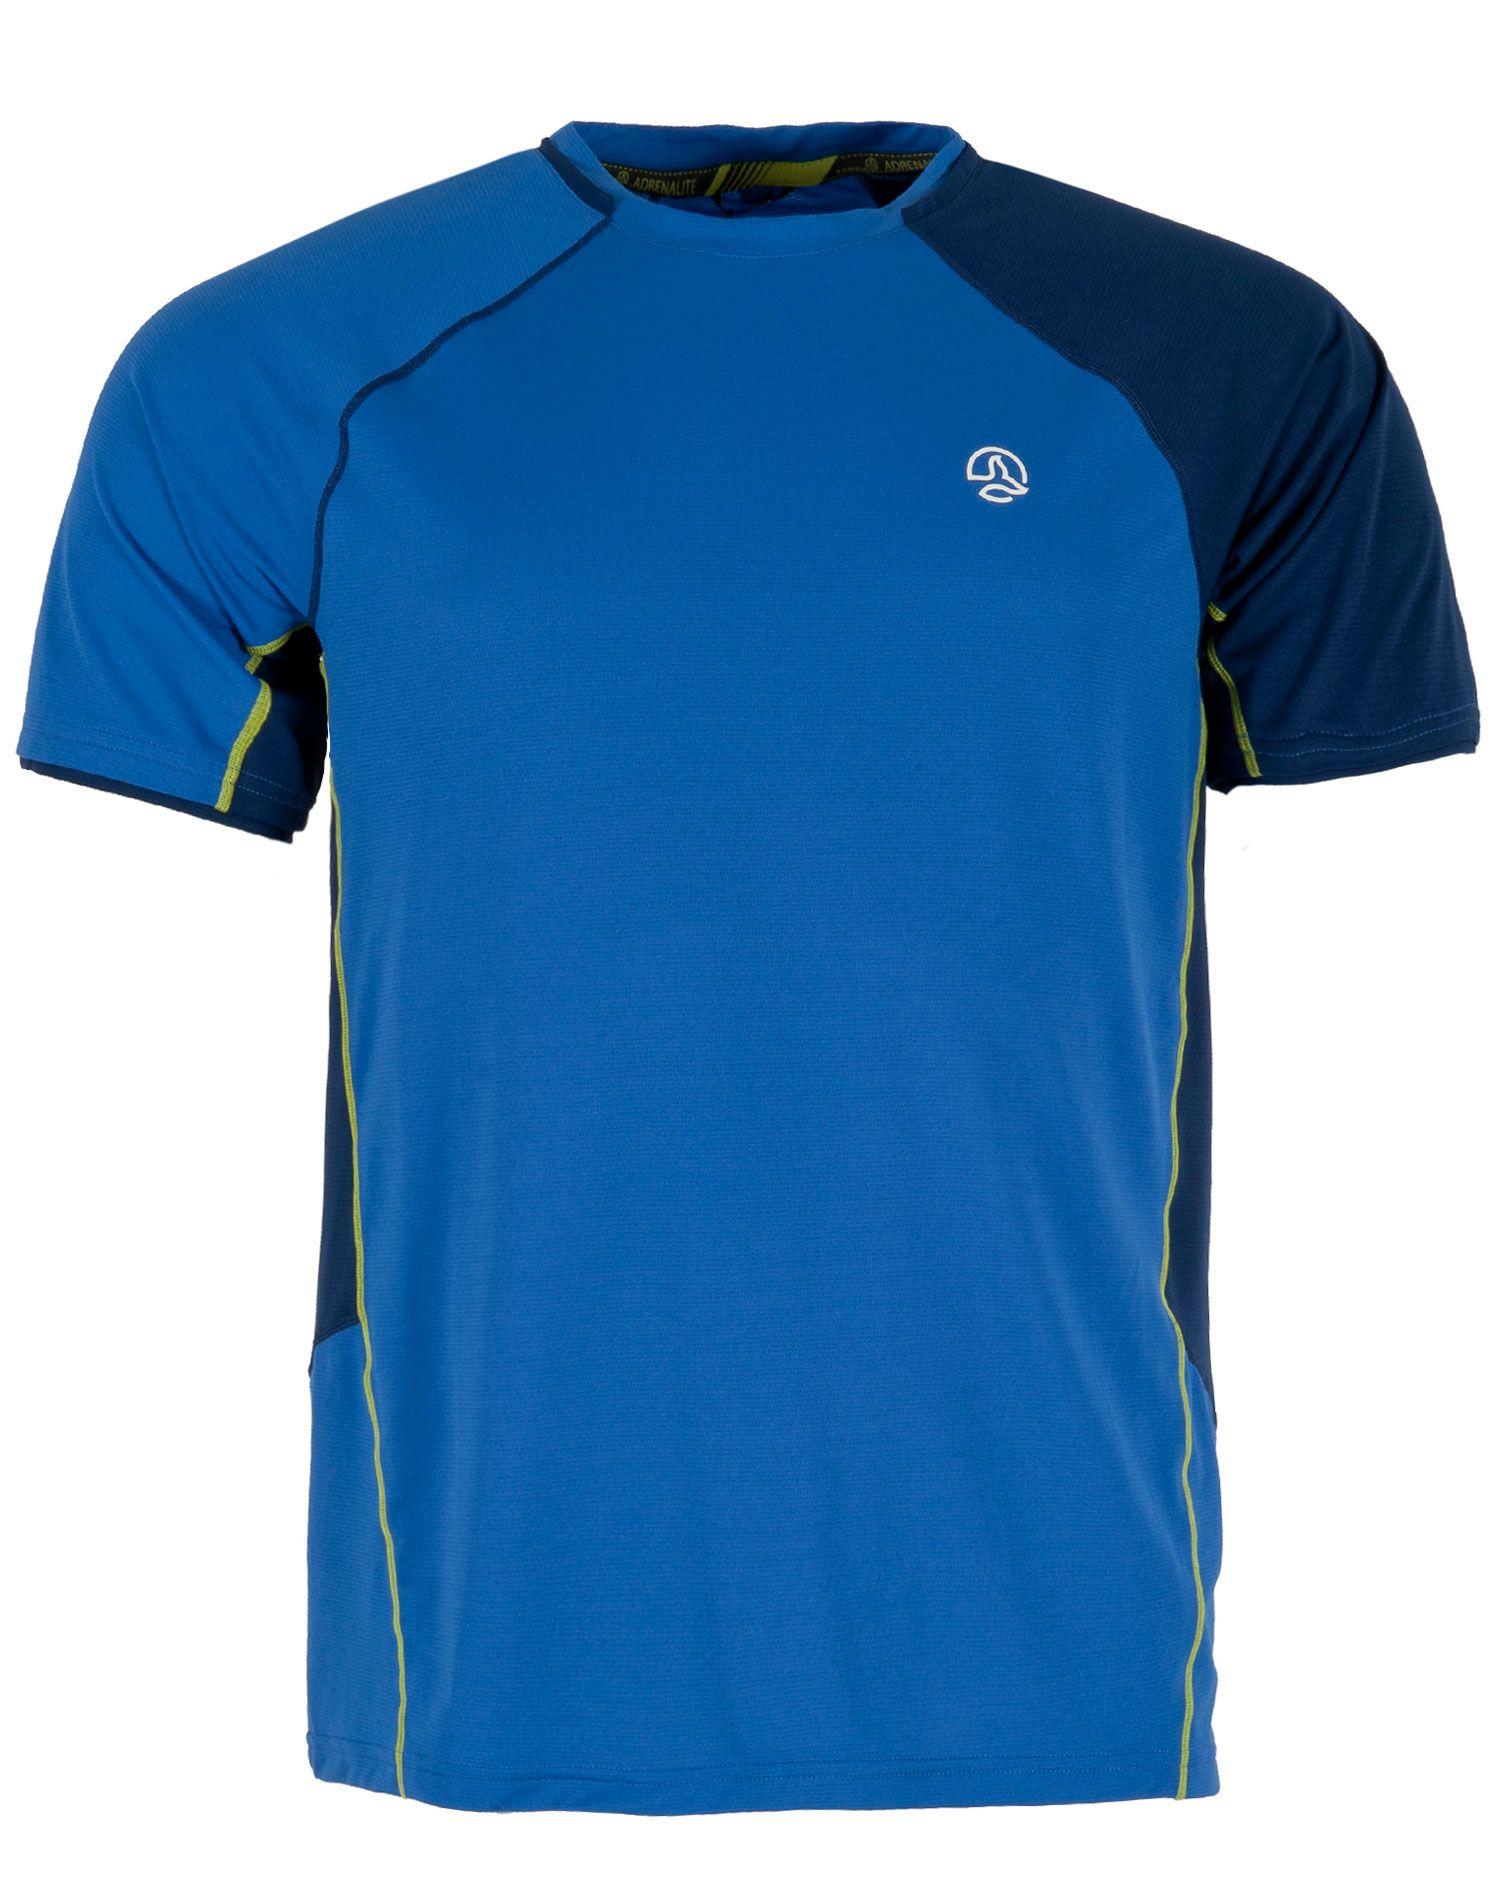 Ternua Sphere - T-shirt - Men's